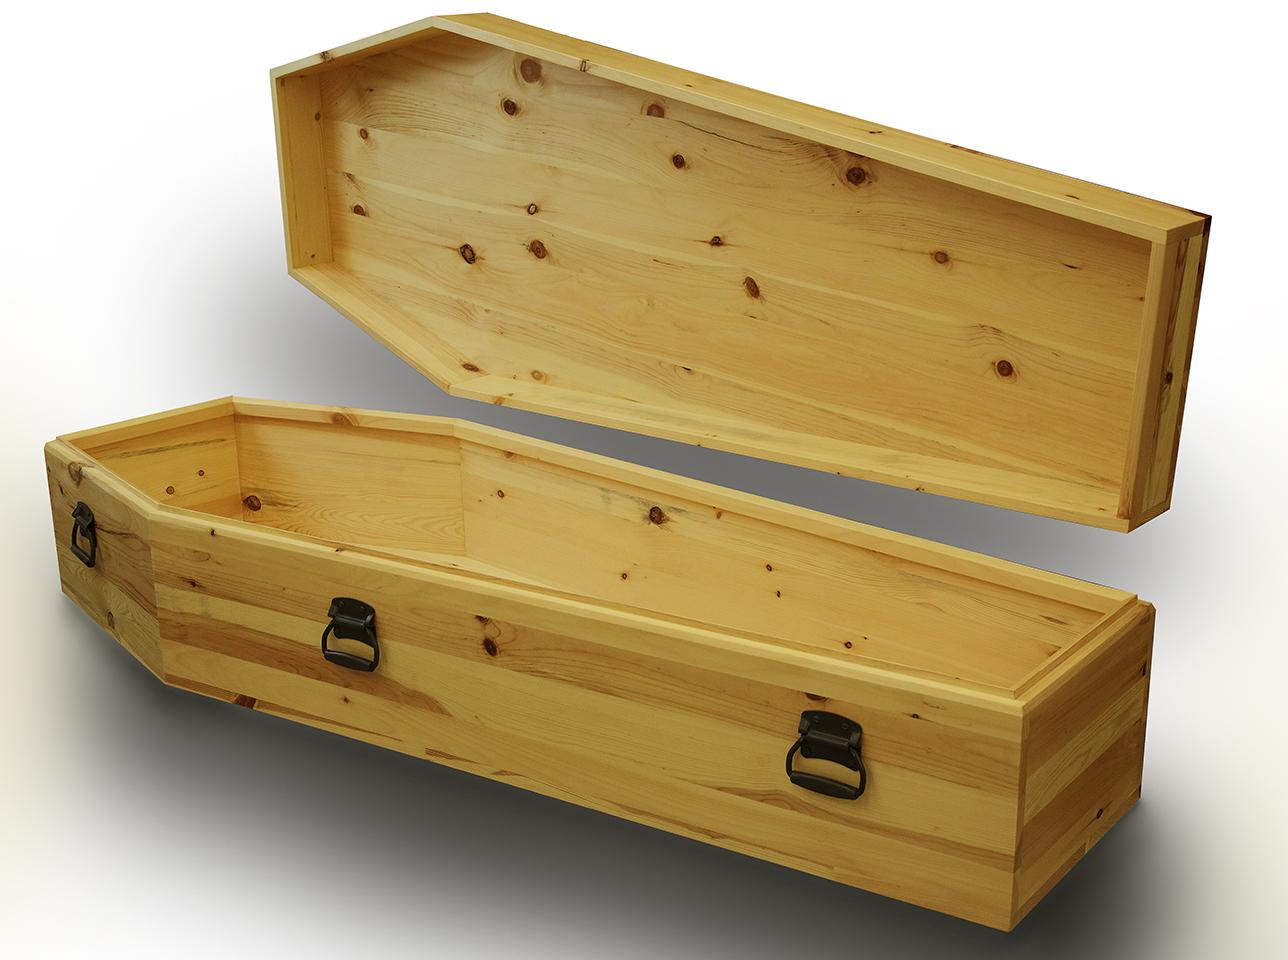 Coffin 1.6.jpg